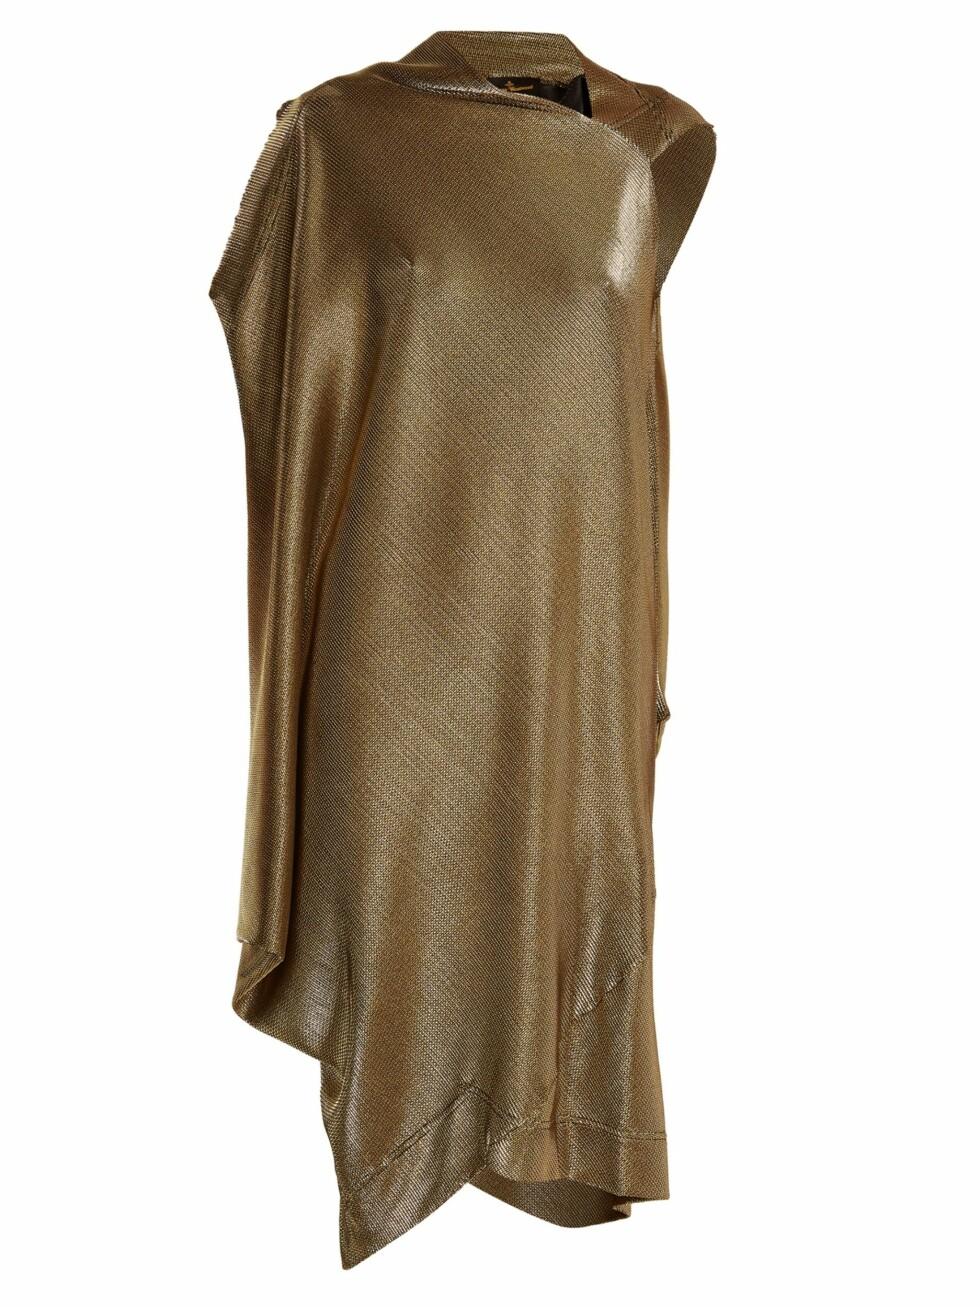 Kjole fra Vivienne Westwood via Matchesfashion.com |3265,.| https://www.matchesfashion.com/intl/products/Vivienne-Westwood-Anglomania-Squires-asymmetric-draped-dress-1160773?qxjkl=tsid:38929|cgn:QFGLnEolOWg&c3ch=LinkShare&c3nid=QFGLnEolOWg&utm_source=linkshare&utm_medium=affiliation&utm_campaign=us&utm_content=QFGLnEolOWg